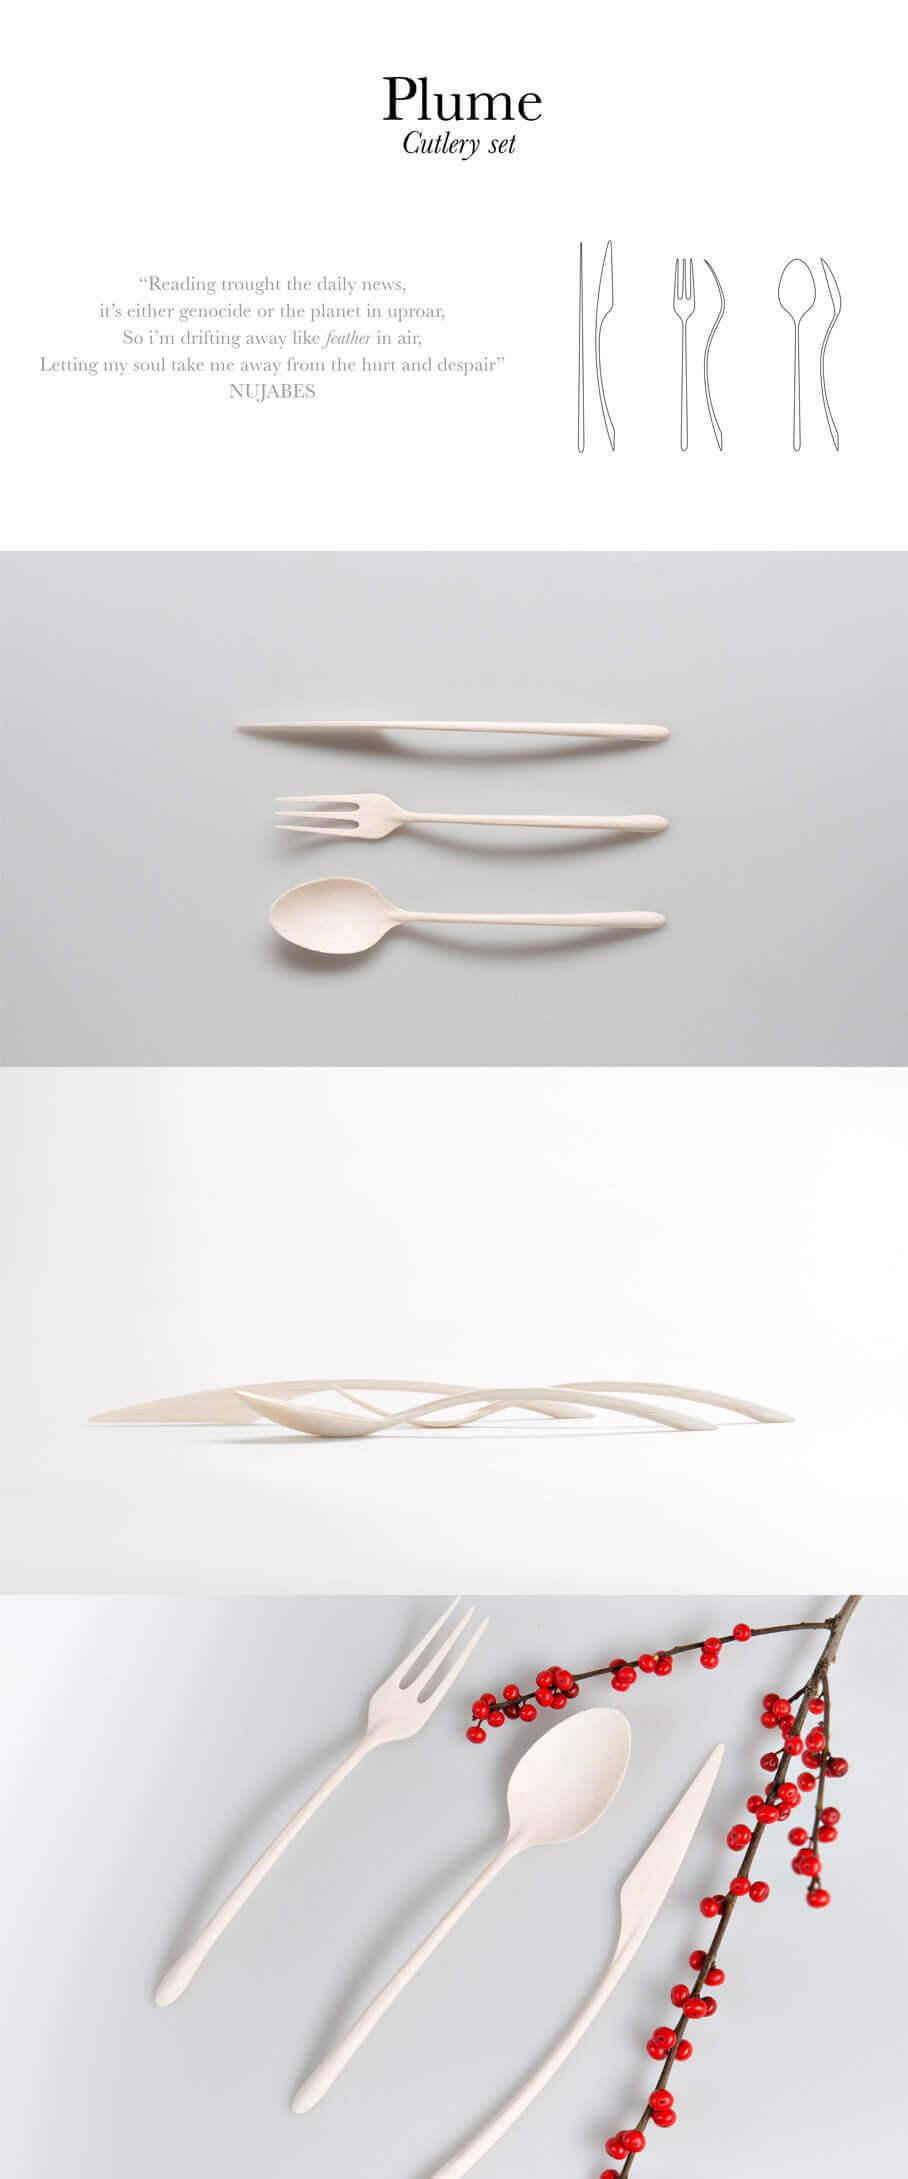 cutlery_portfolio